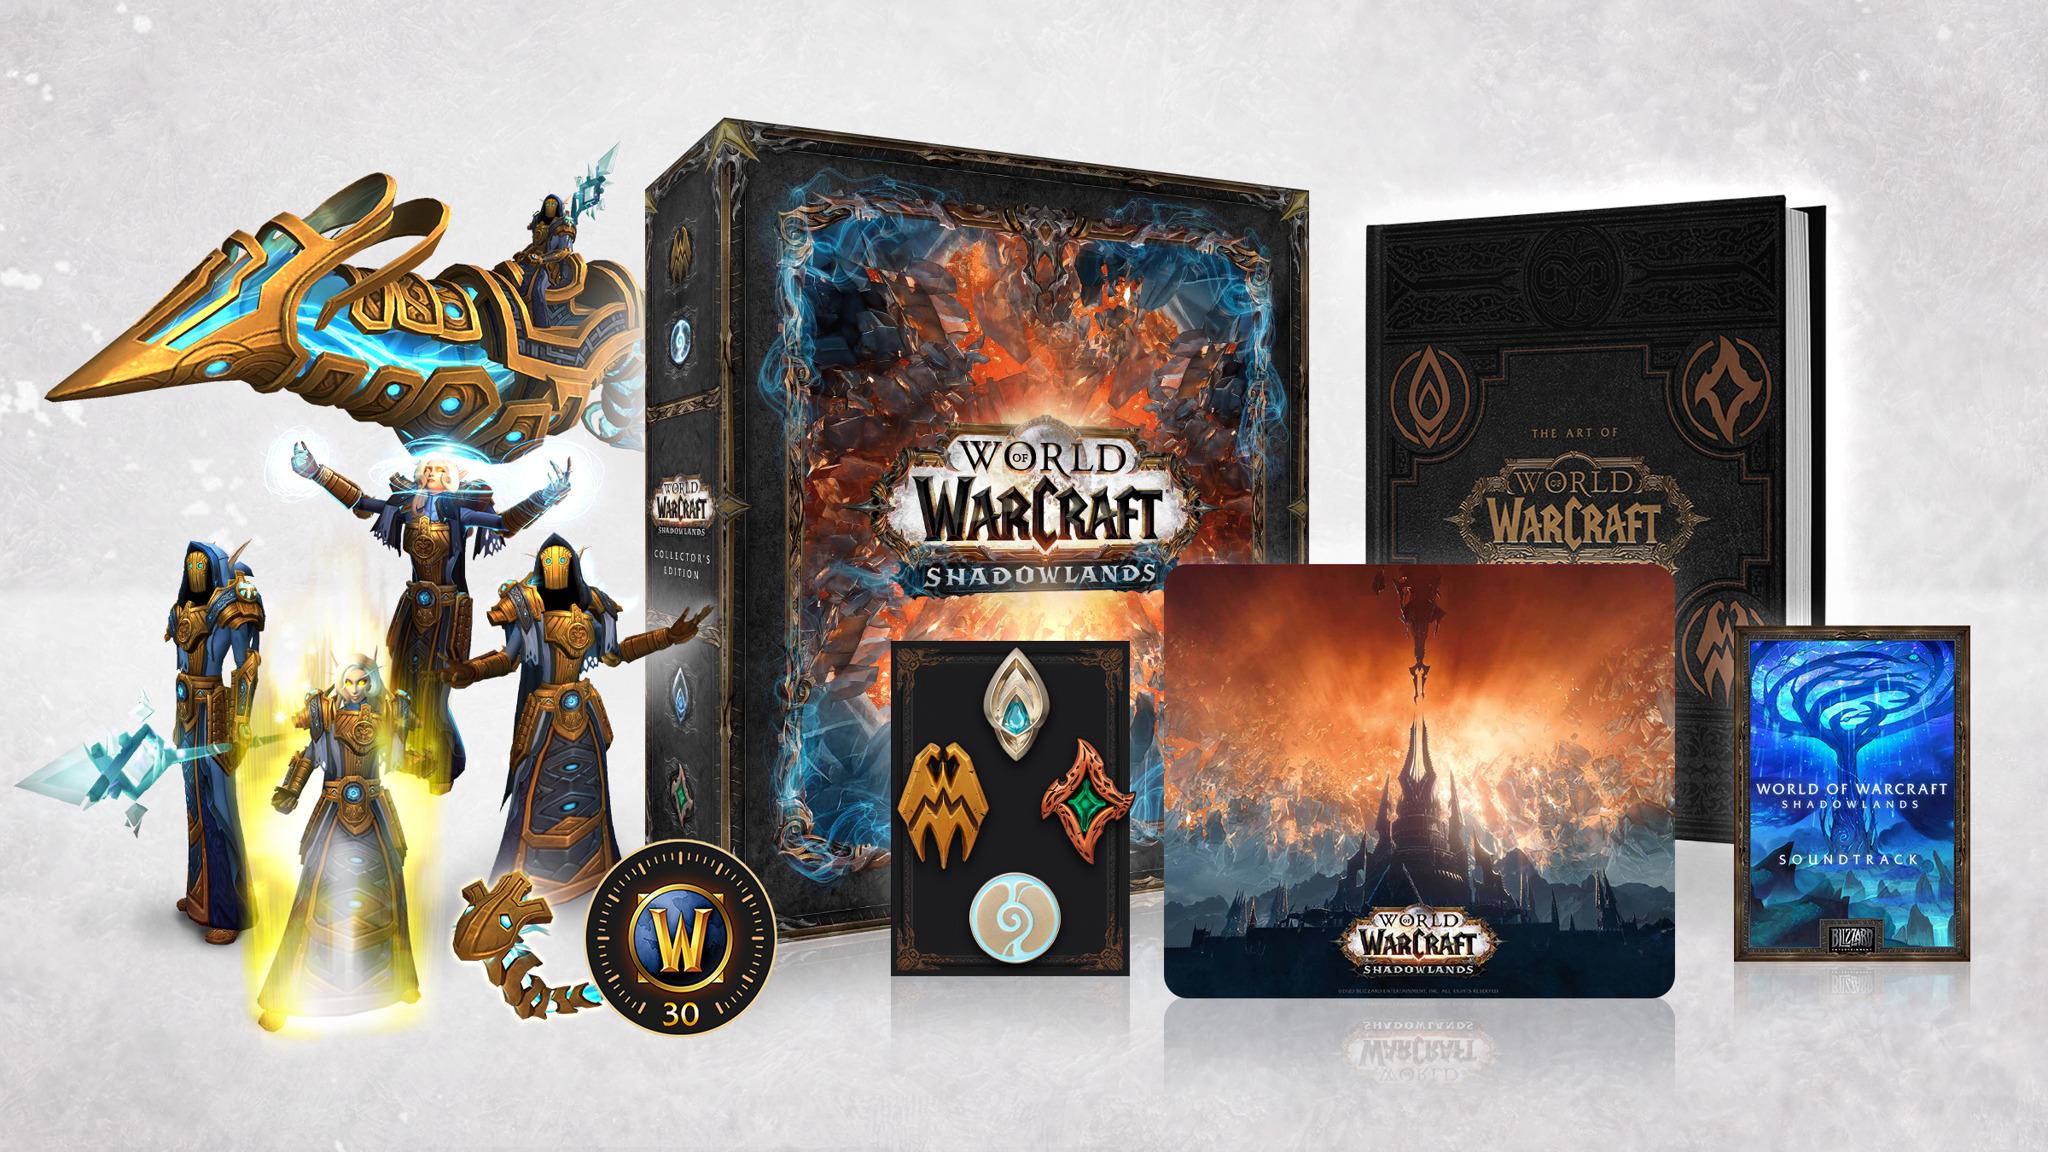 https blizzard fr prezly com ledition collector de world of warcraft shadowlands se devoile